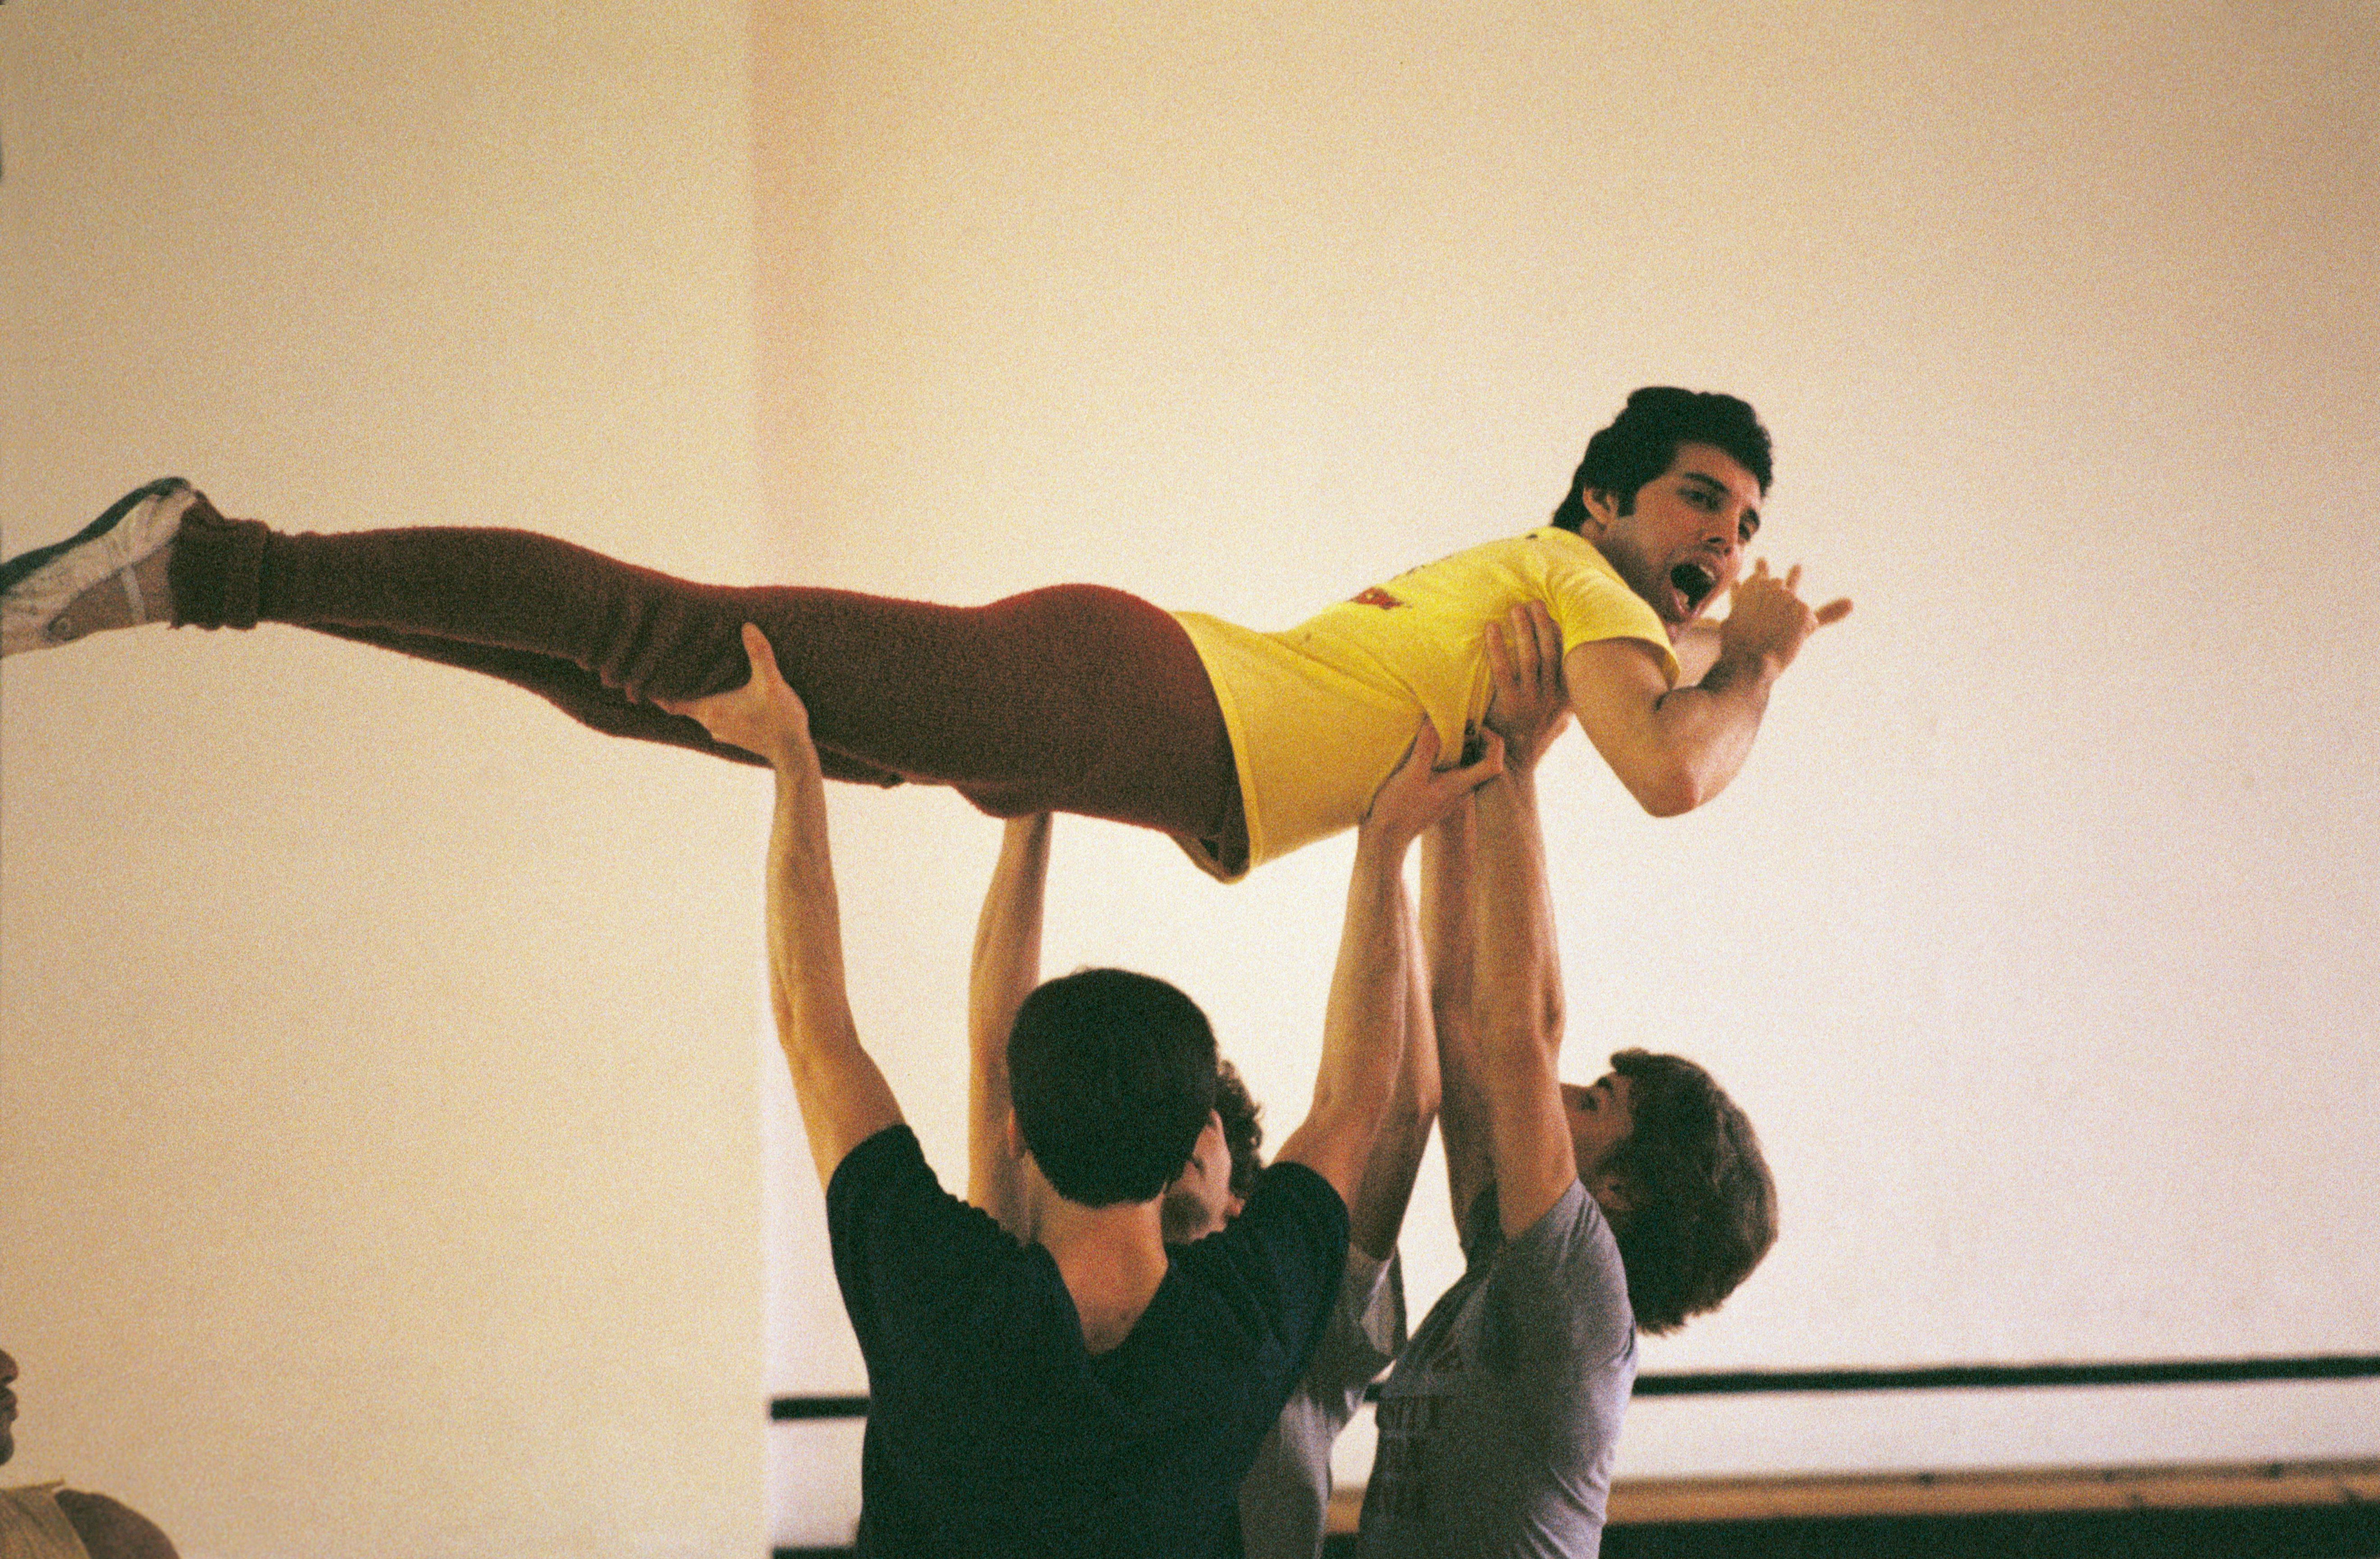 Freddie Mercury gets training from a ballet instru